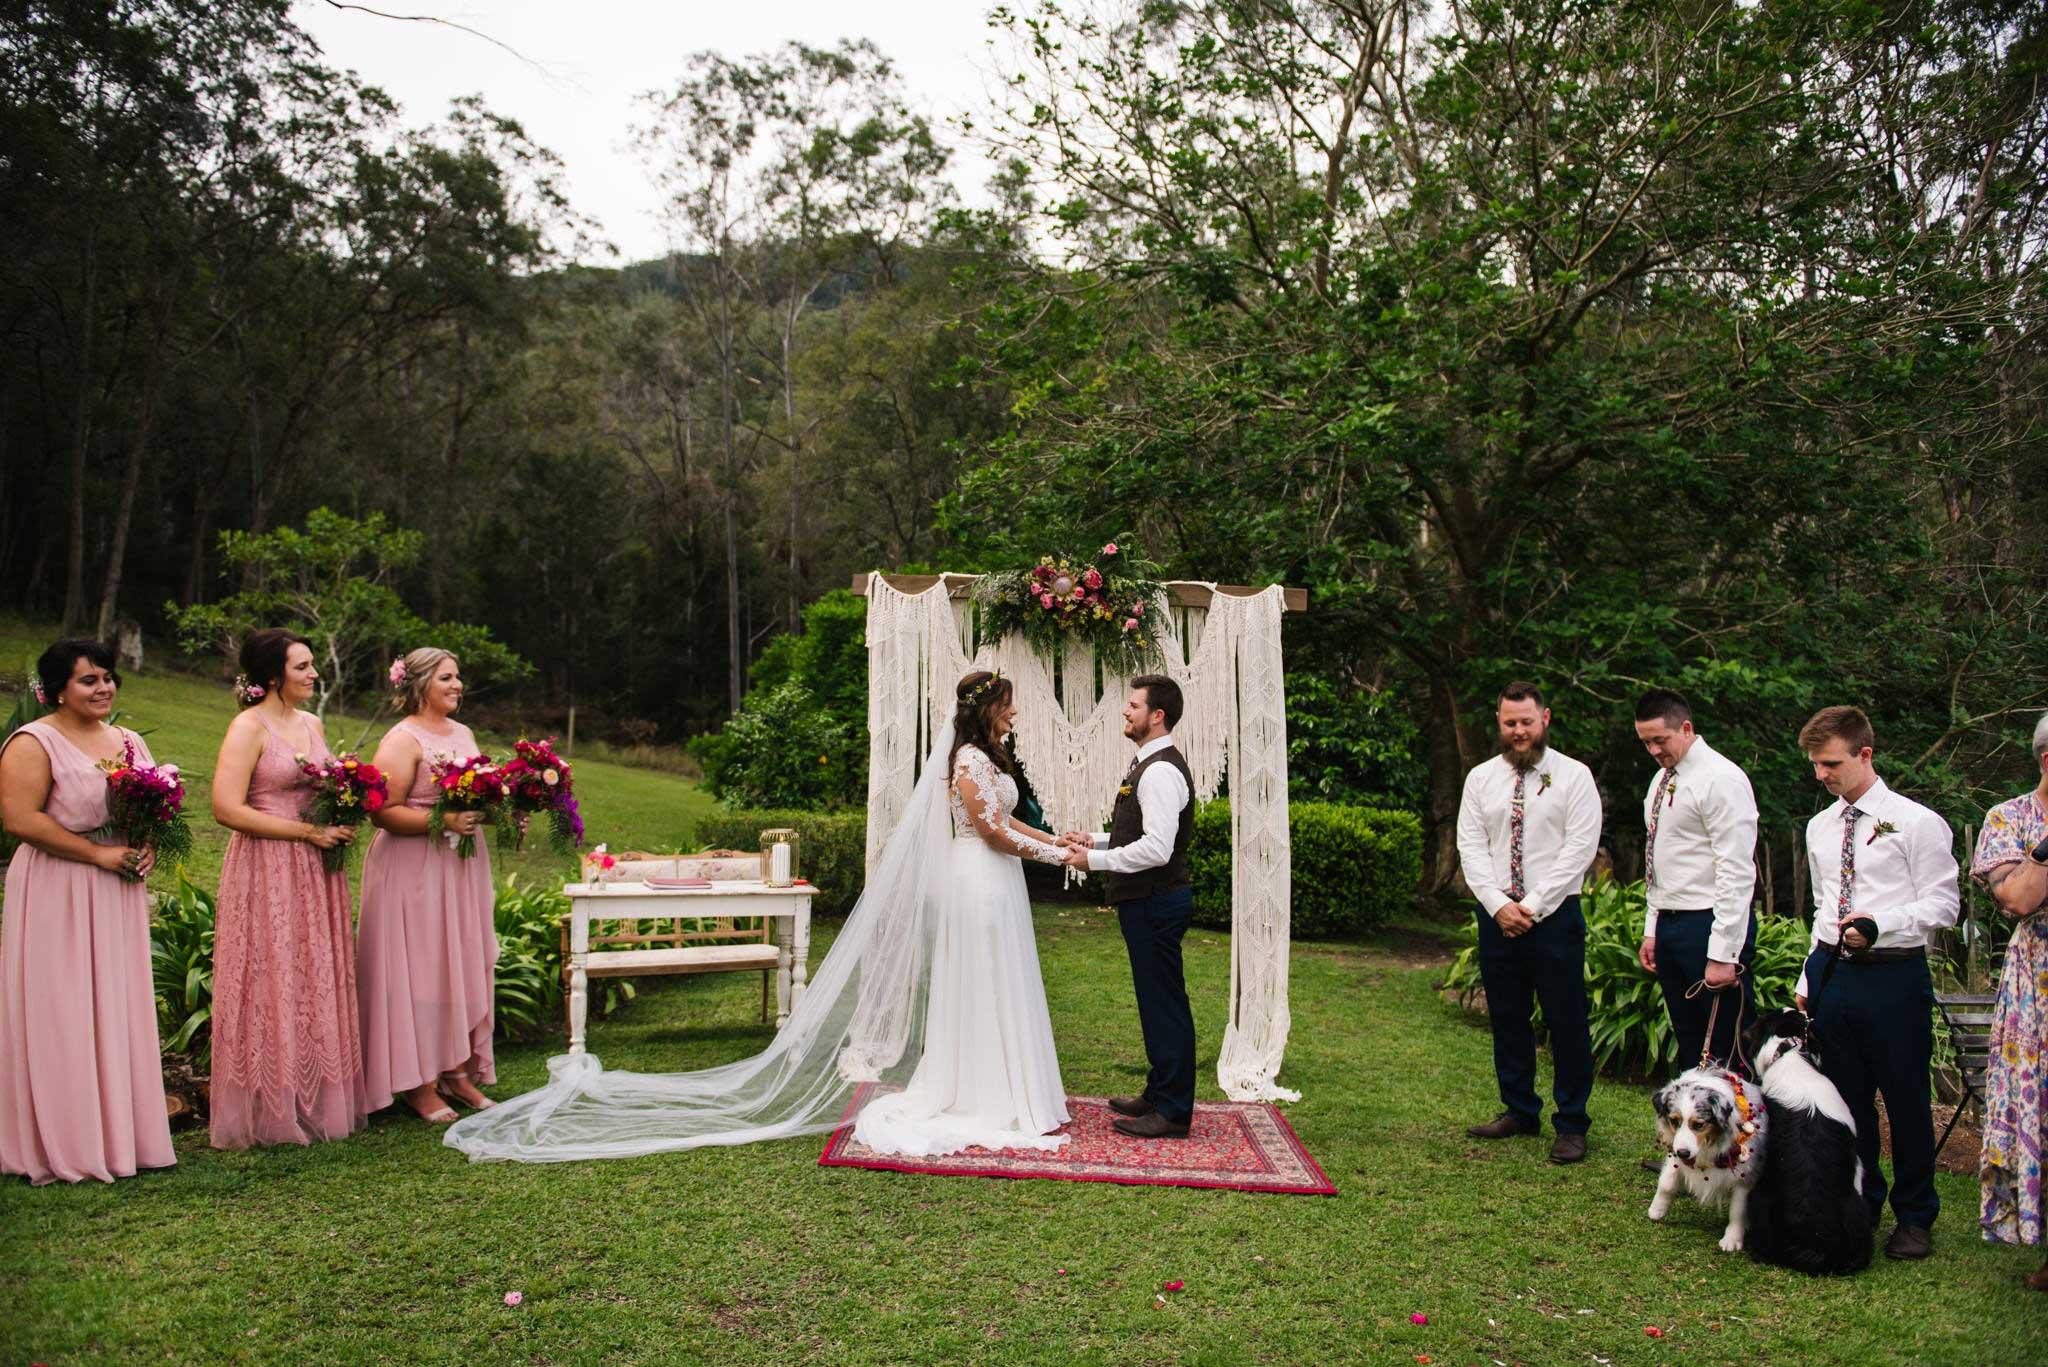 Rustic wedding ceremony with macrame altar